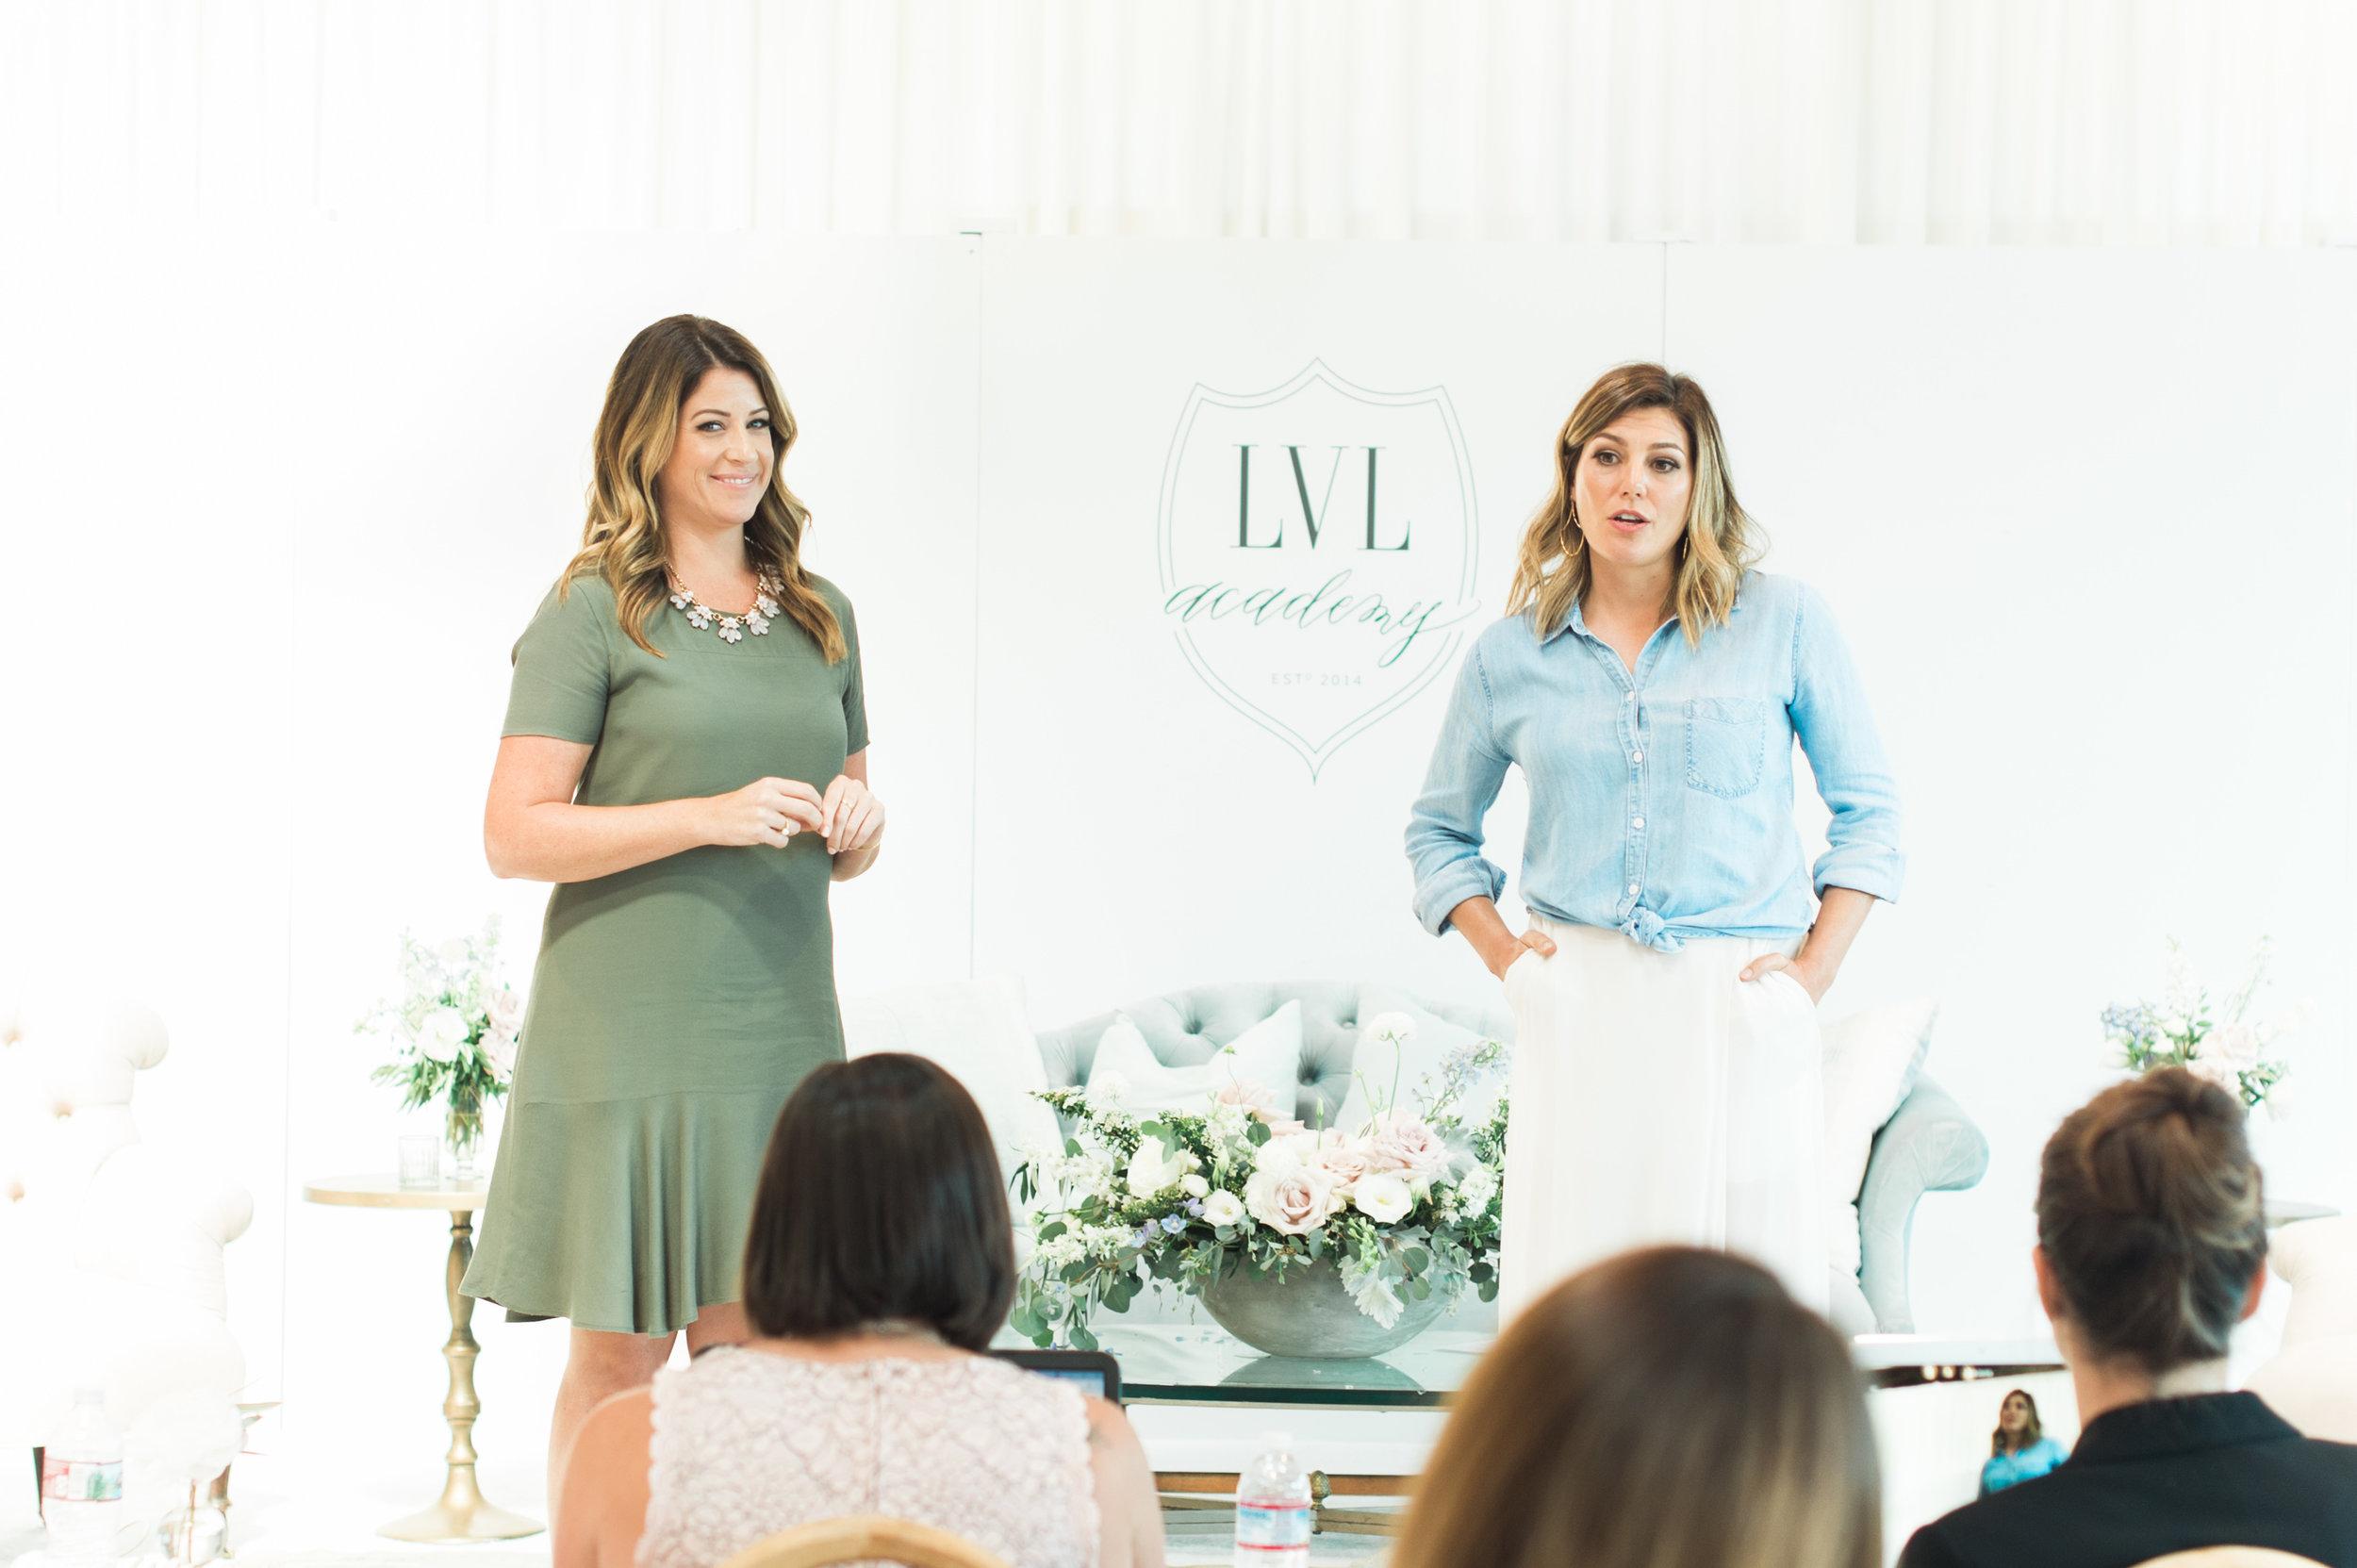 Heather and Lindsay shed light on social media